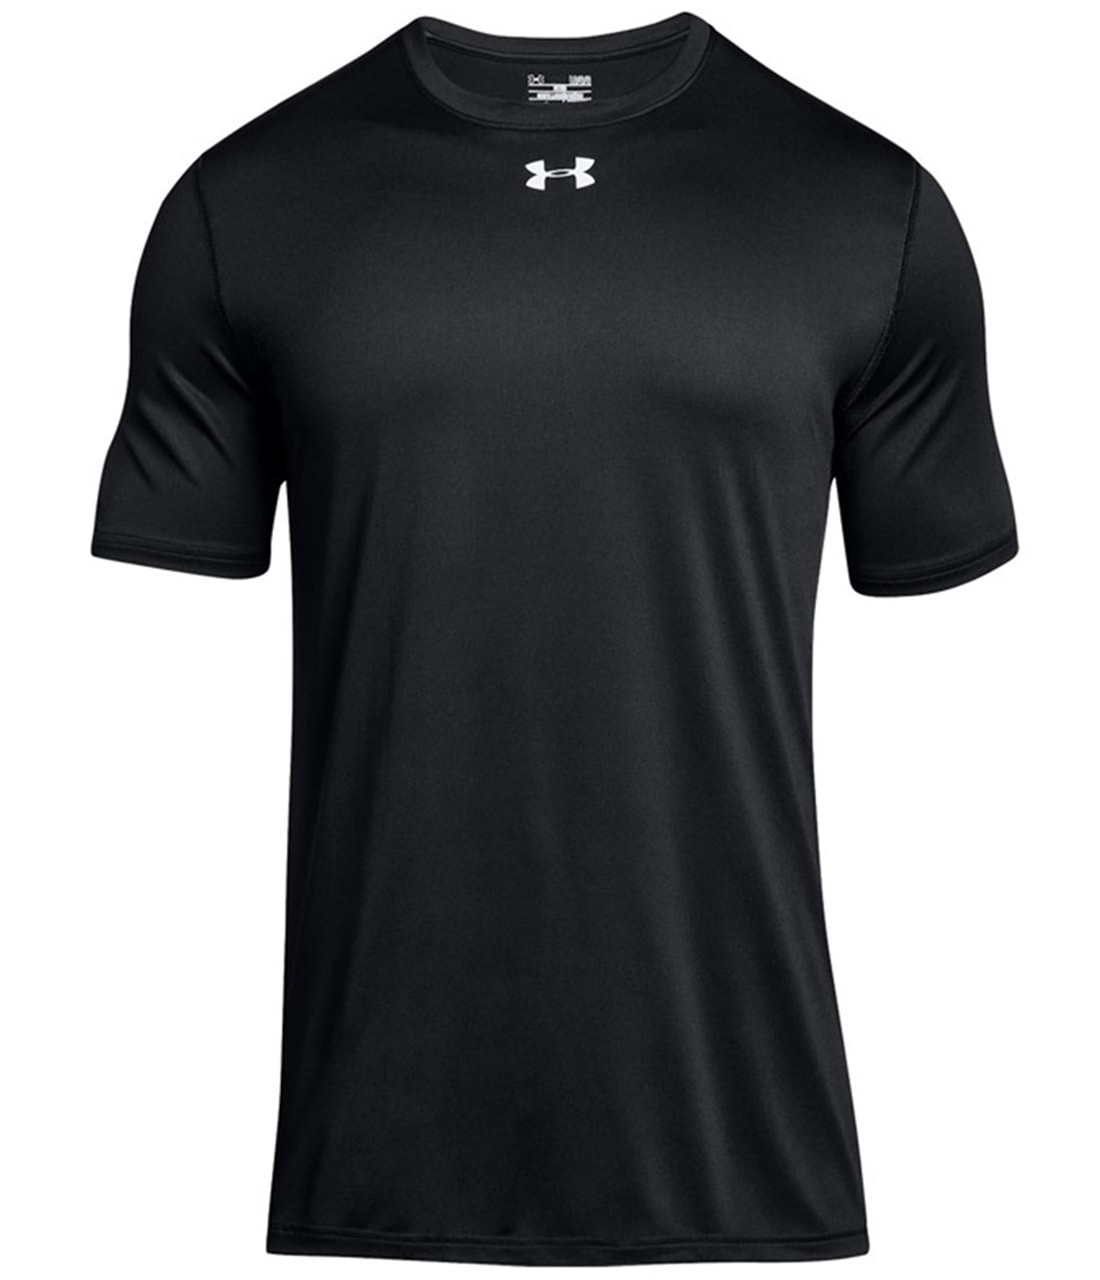 Picture of Under Armour Men's Short Sleeve Locker T-Shirt